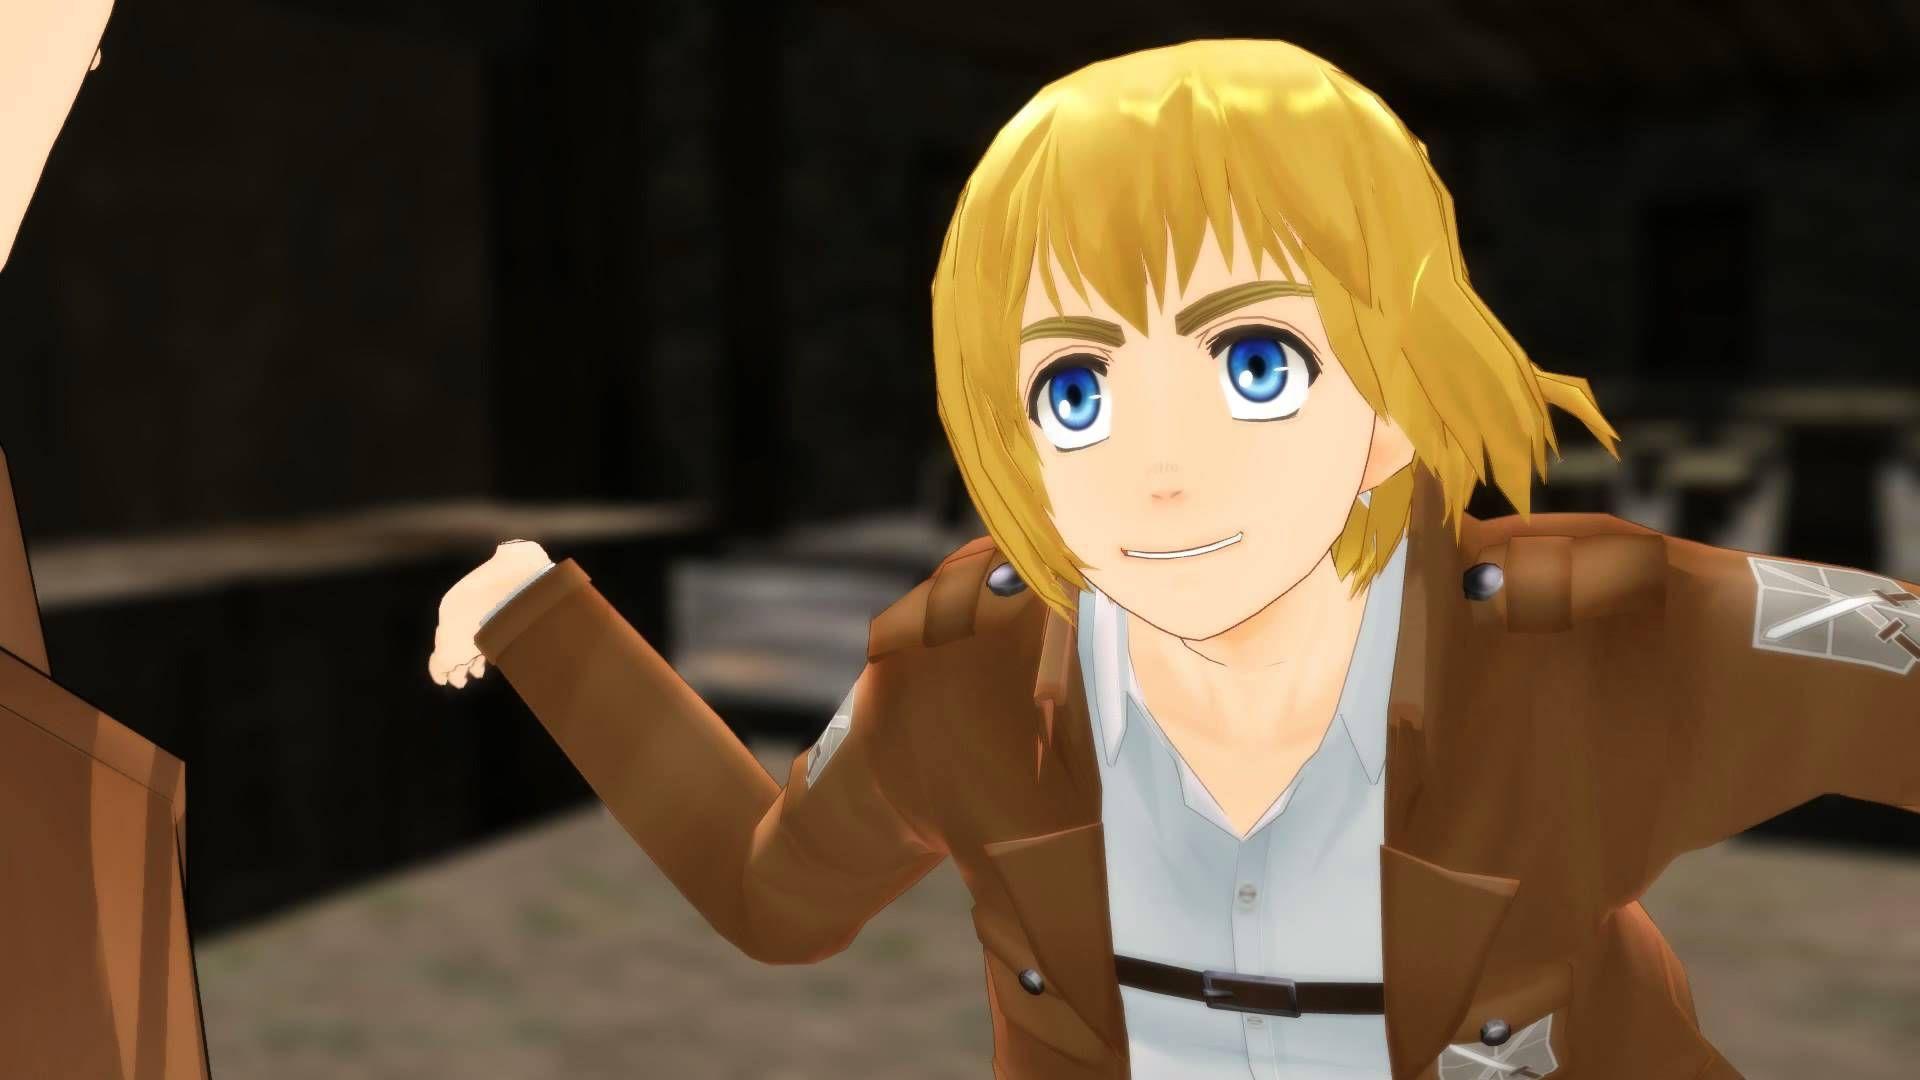 Mmd Street Rules Man Armin And Eren Funny Meme Attack On Titan Snk Shingeki No Kyojin Attack On Titan Armin Funny Memes